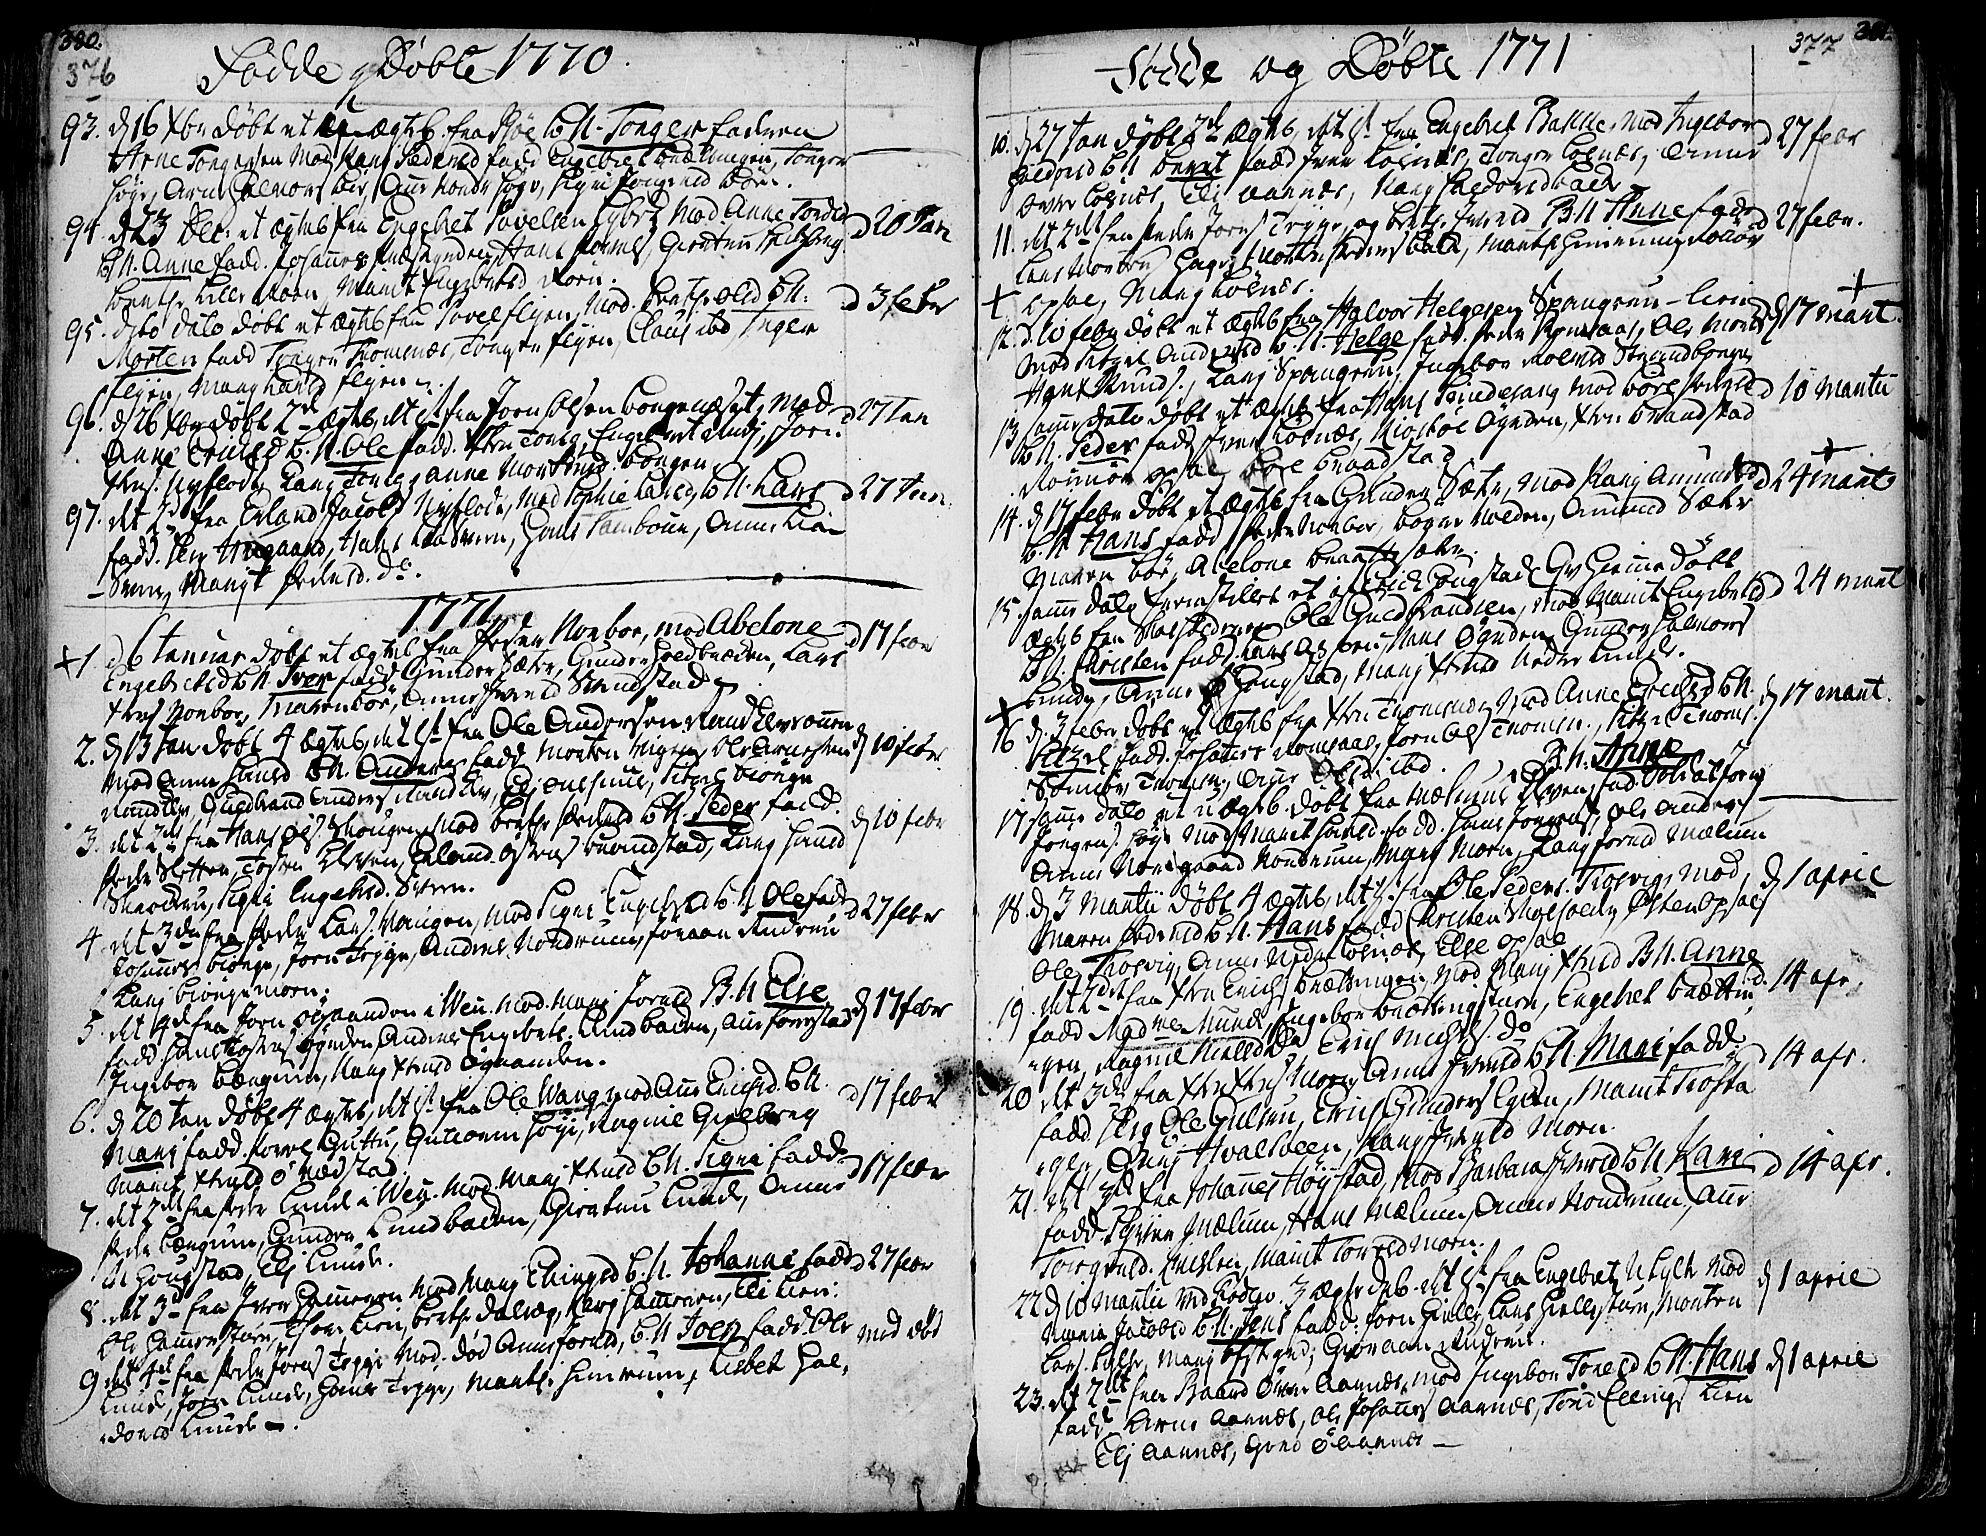 SAH, Ringebu prestekontor, Ministerialbok nr. 2, 1734-1780, s. 376-377